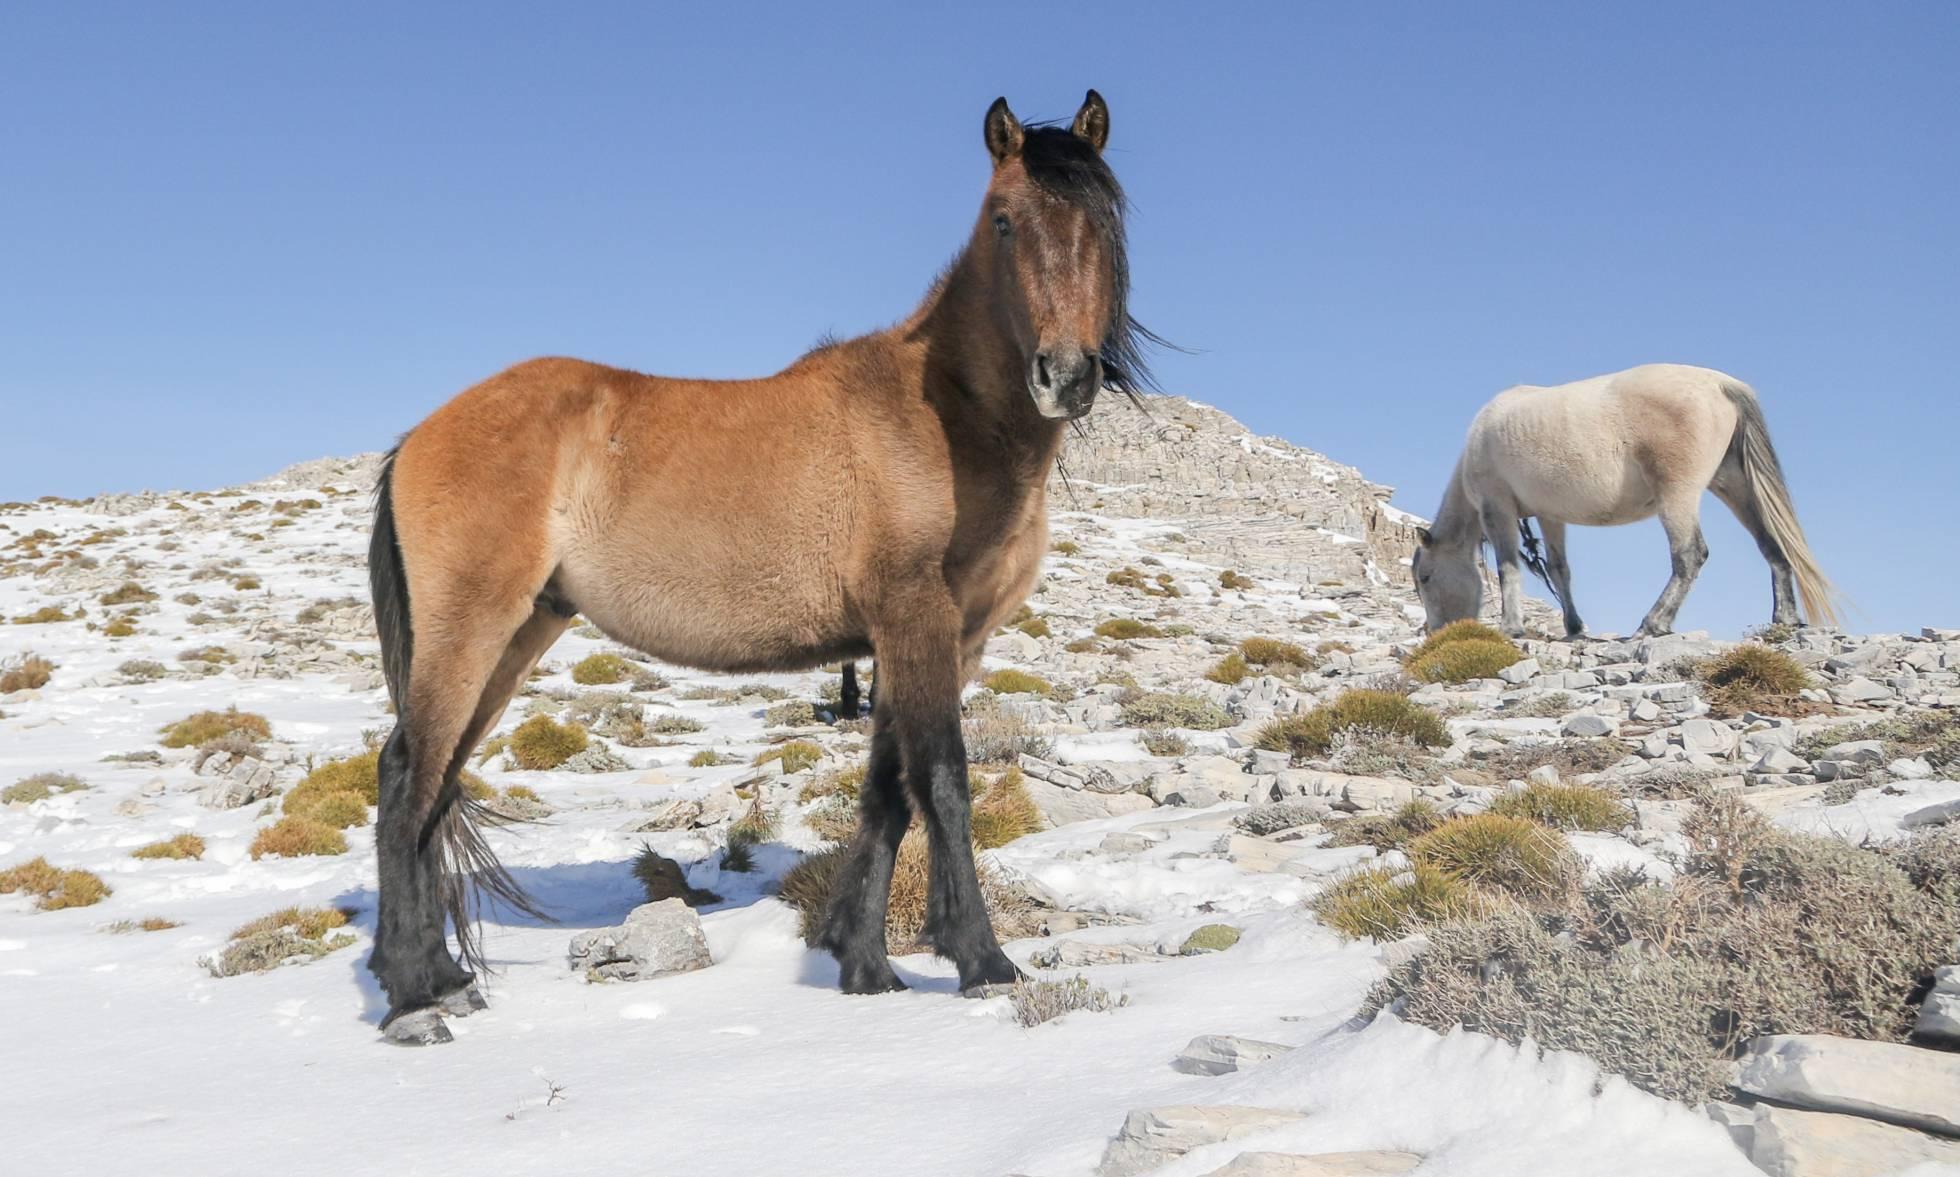 Caballos salvajes en Andalucía | Gustavo Mirabal